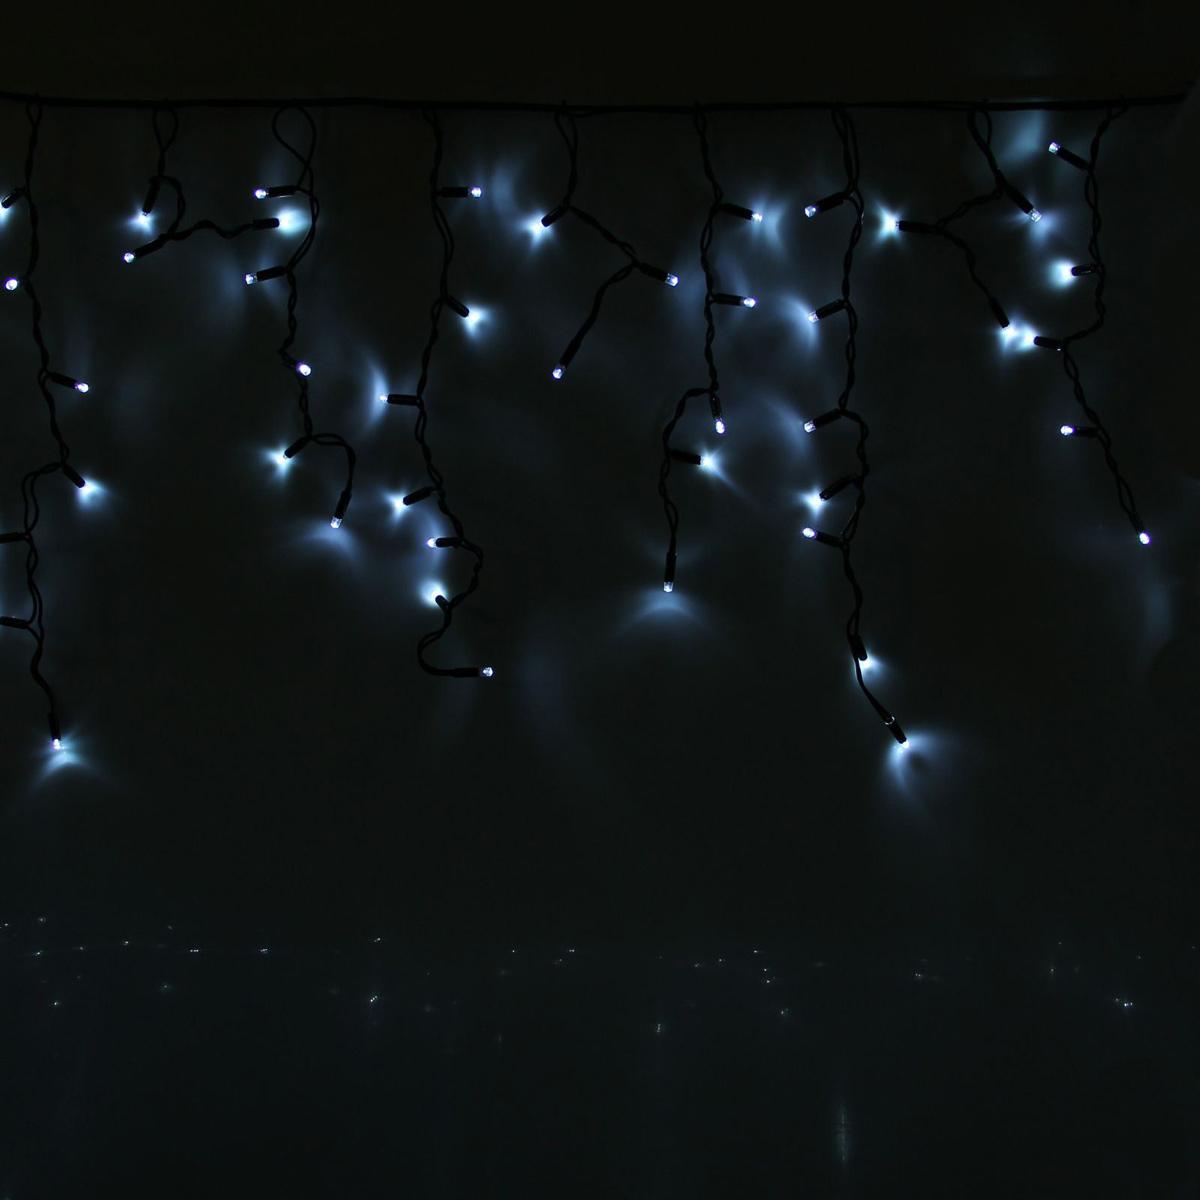 Гирлянда светодиодная Luazon Бахрома, уличная, 180 ламп, 220 V, цвет: белый, 4 х 0,6 м. 1080648 гирлянда luazon дождь 2m 6m multicolor 671678